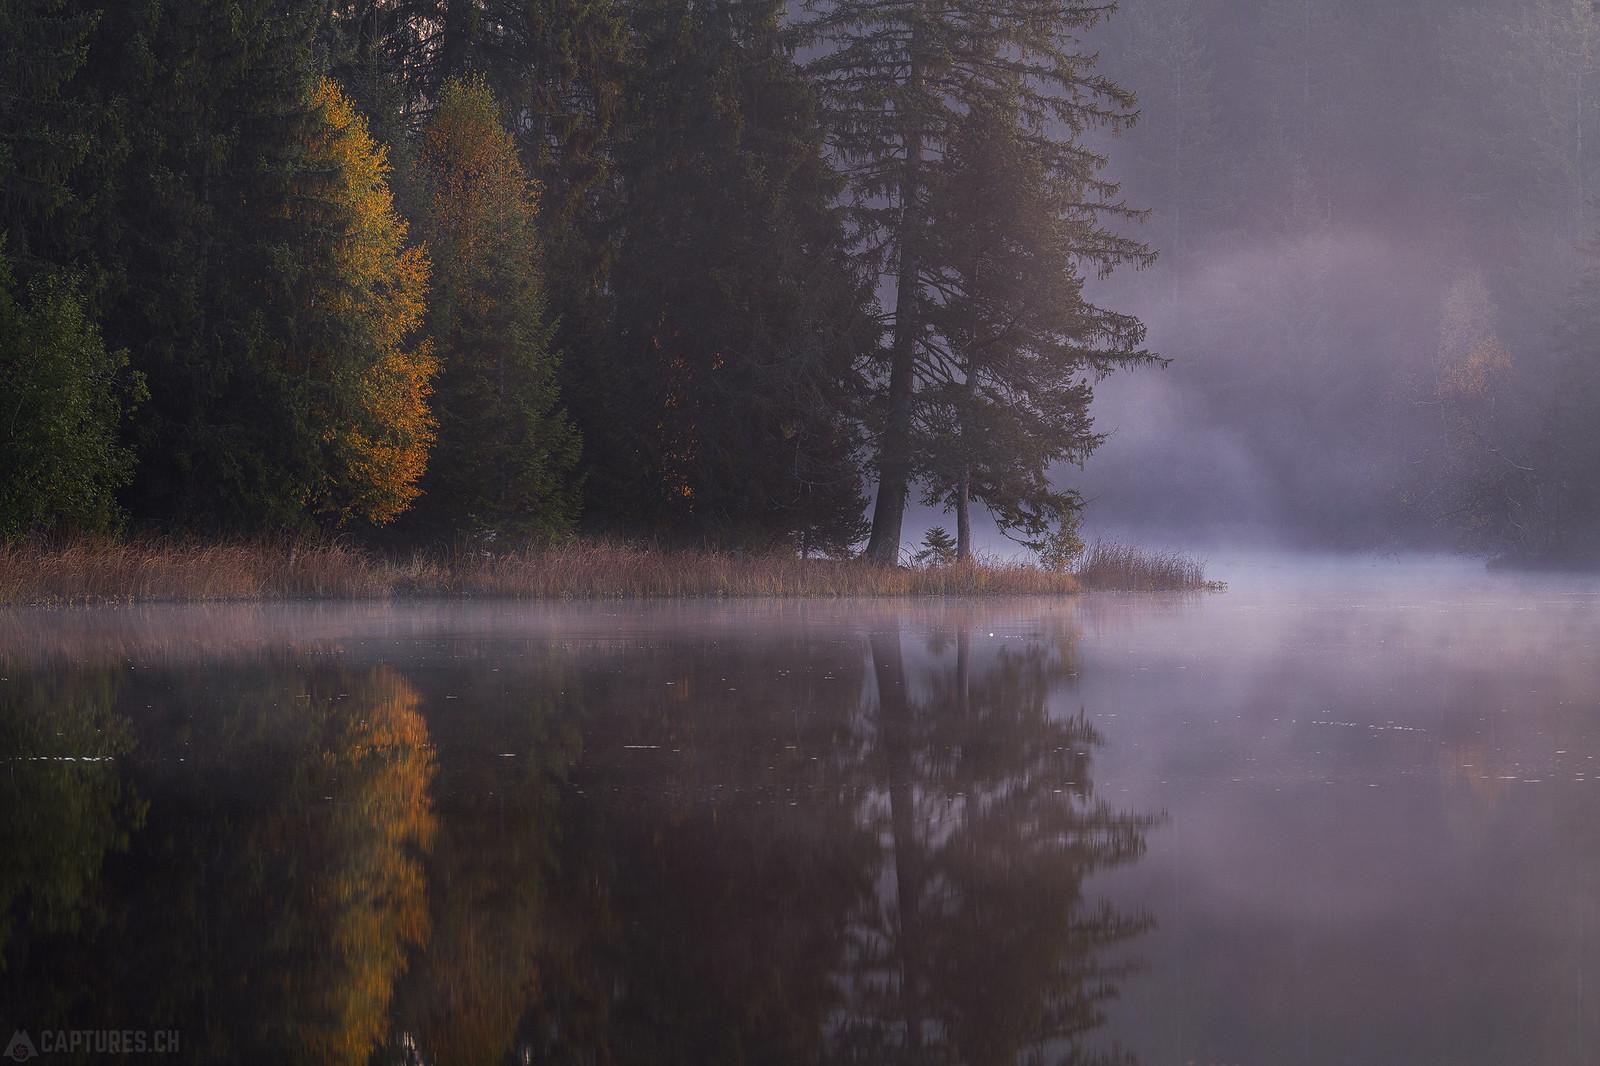 Morning fog - Étang de la Gruère